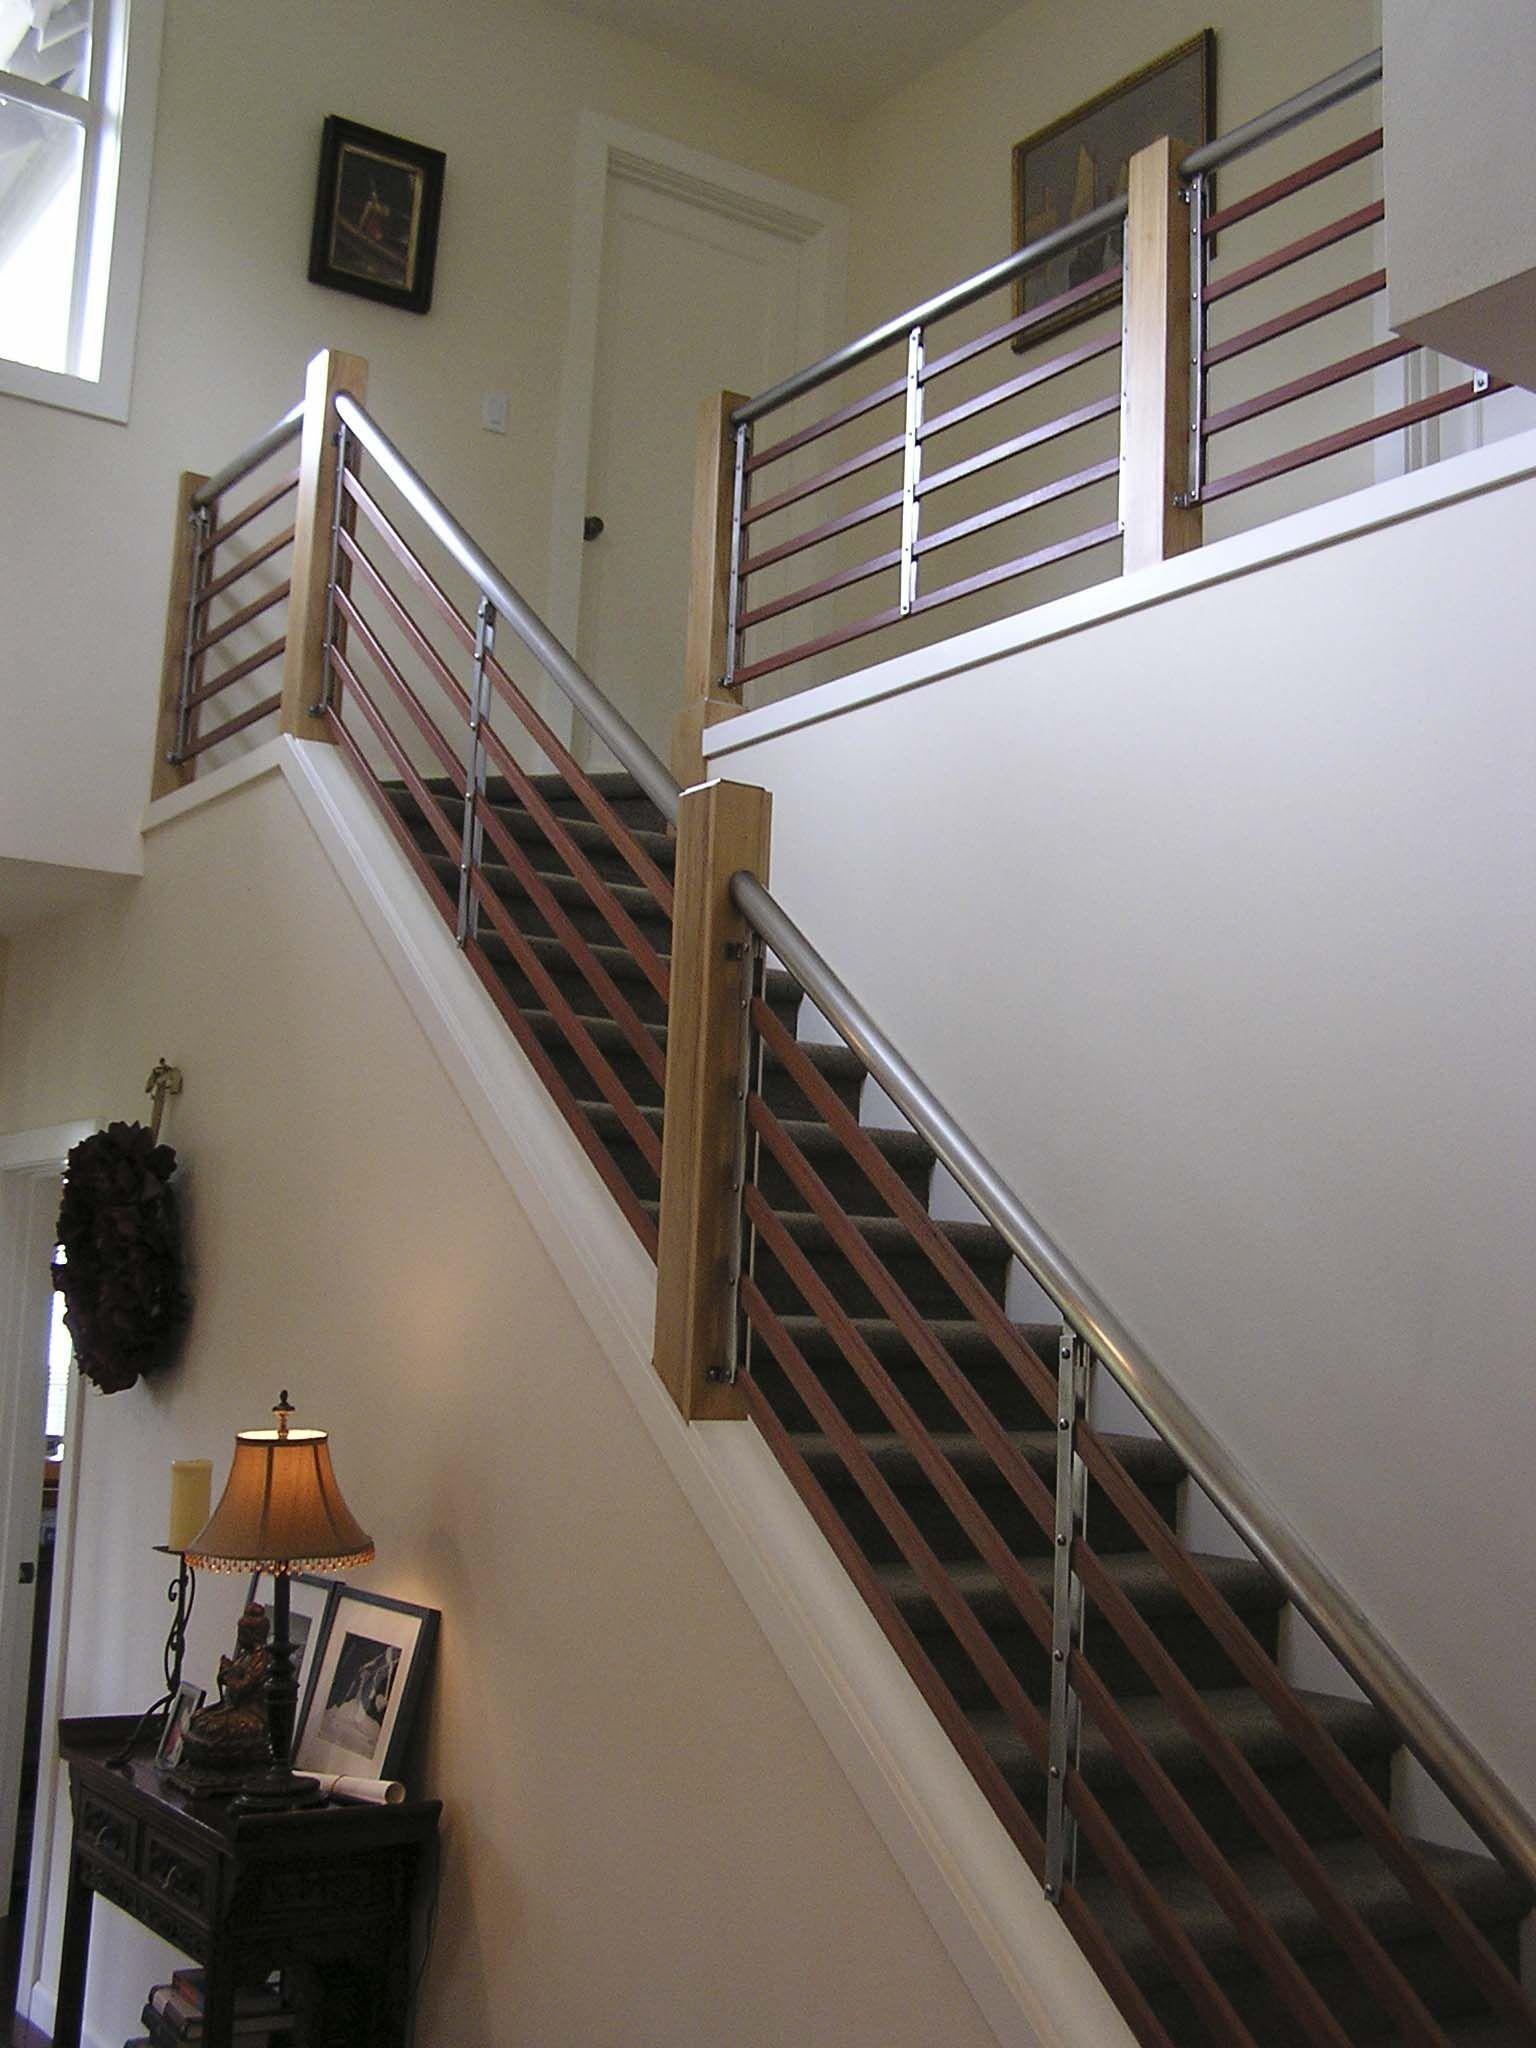 Railings Railings Pinterest Stair Walls Stair Railing And Stairs